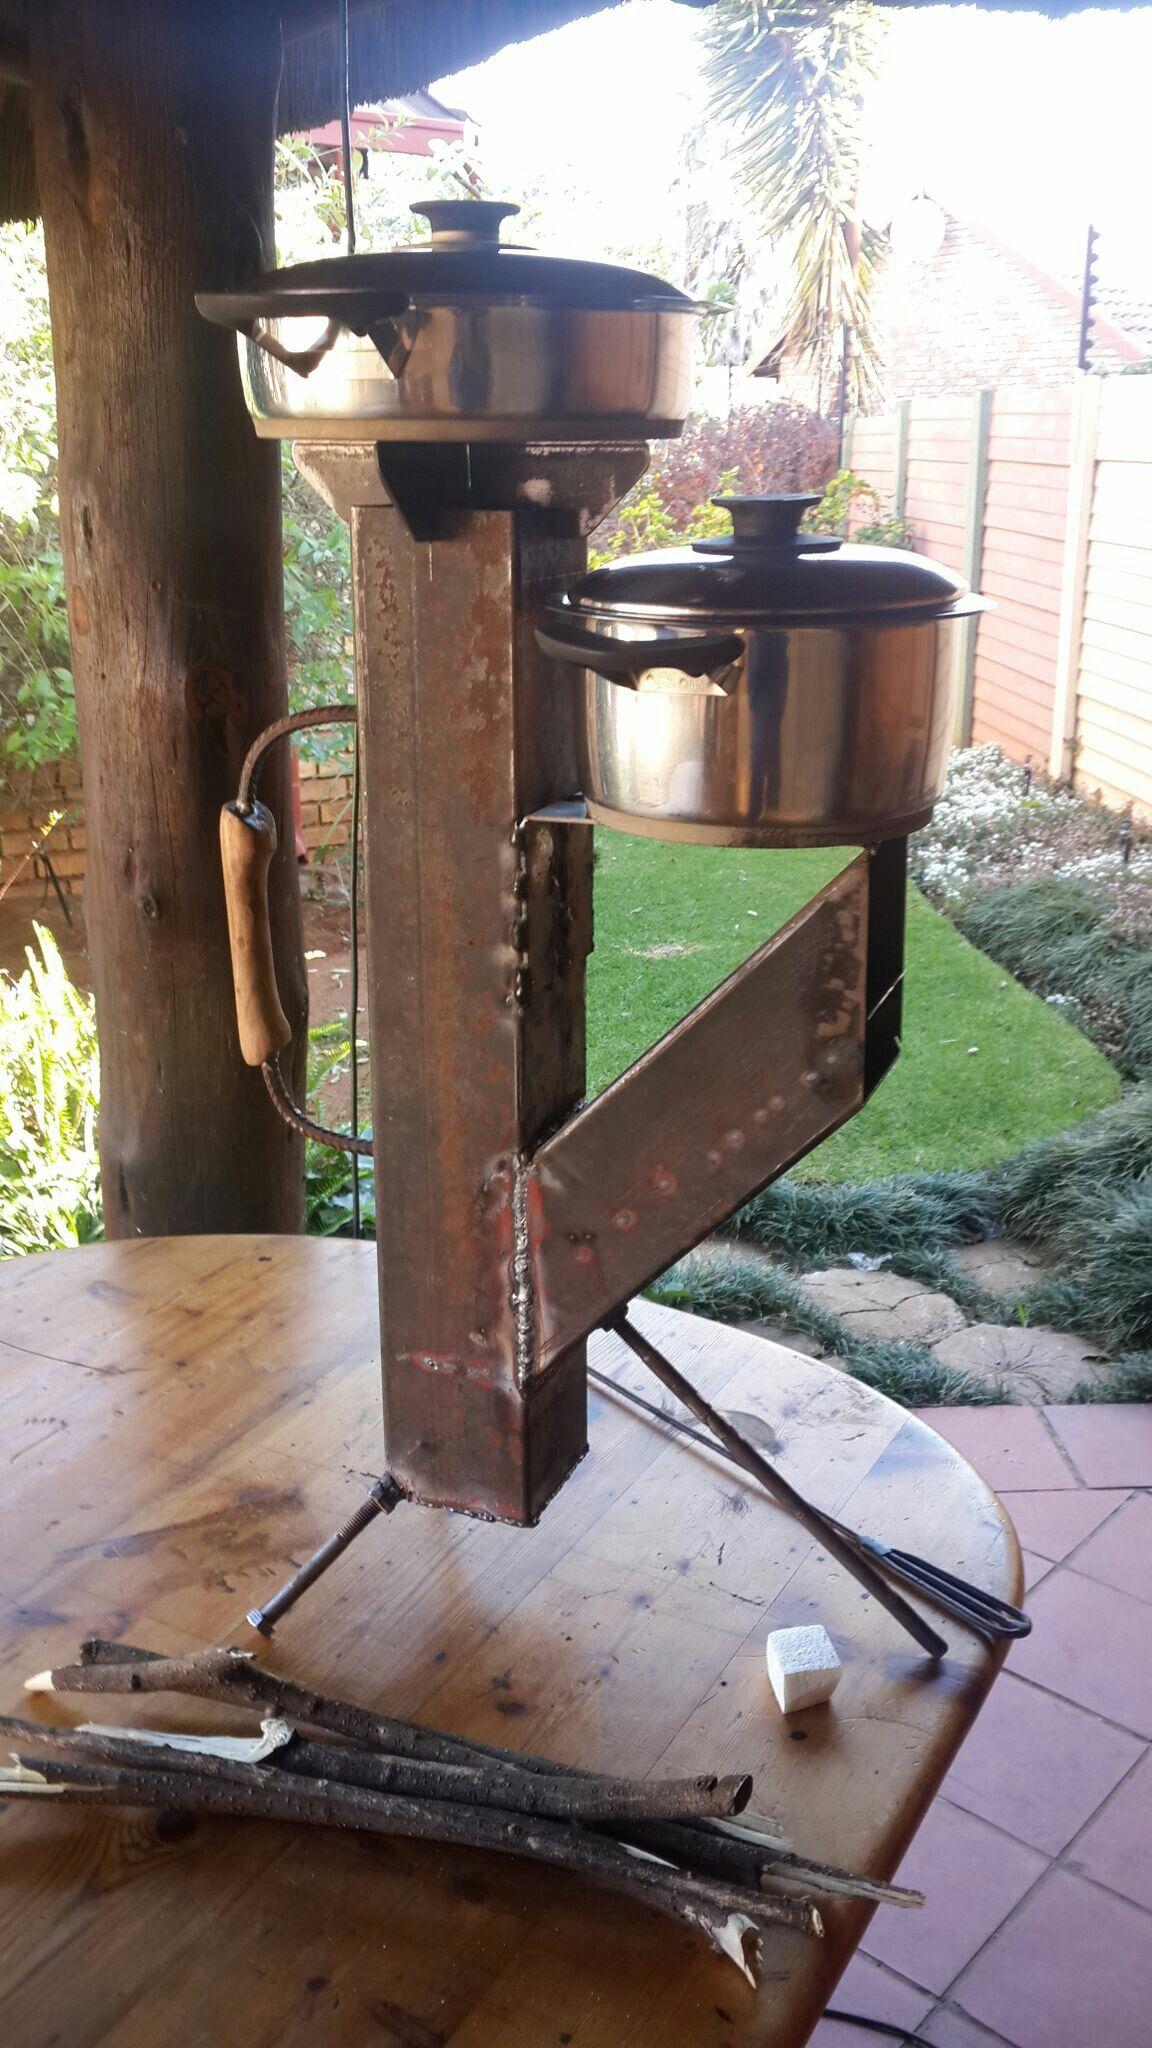 Best rocket stove design main stove plus 200mm hotplate for Best design